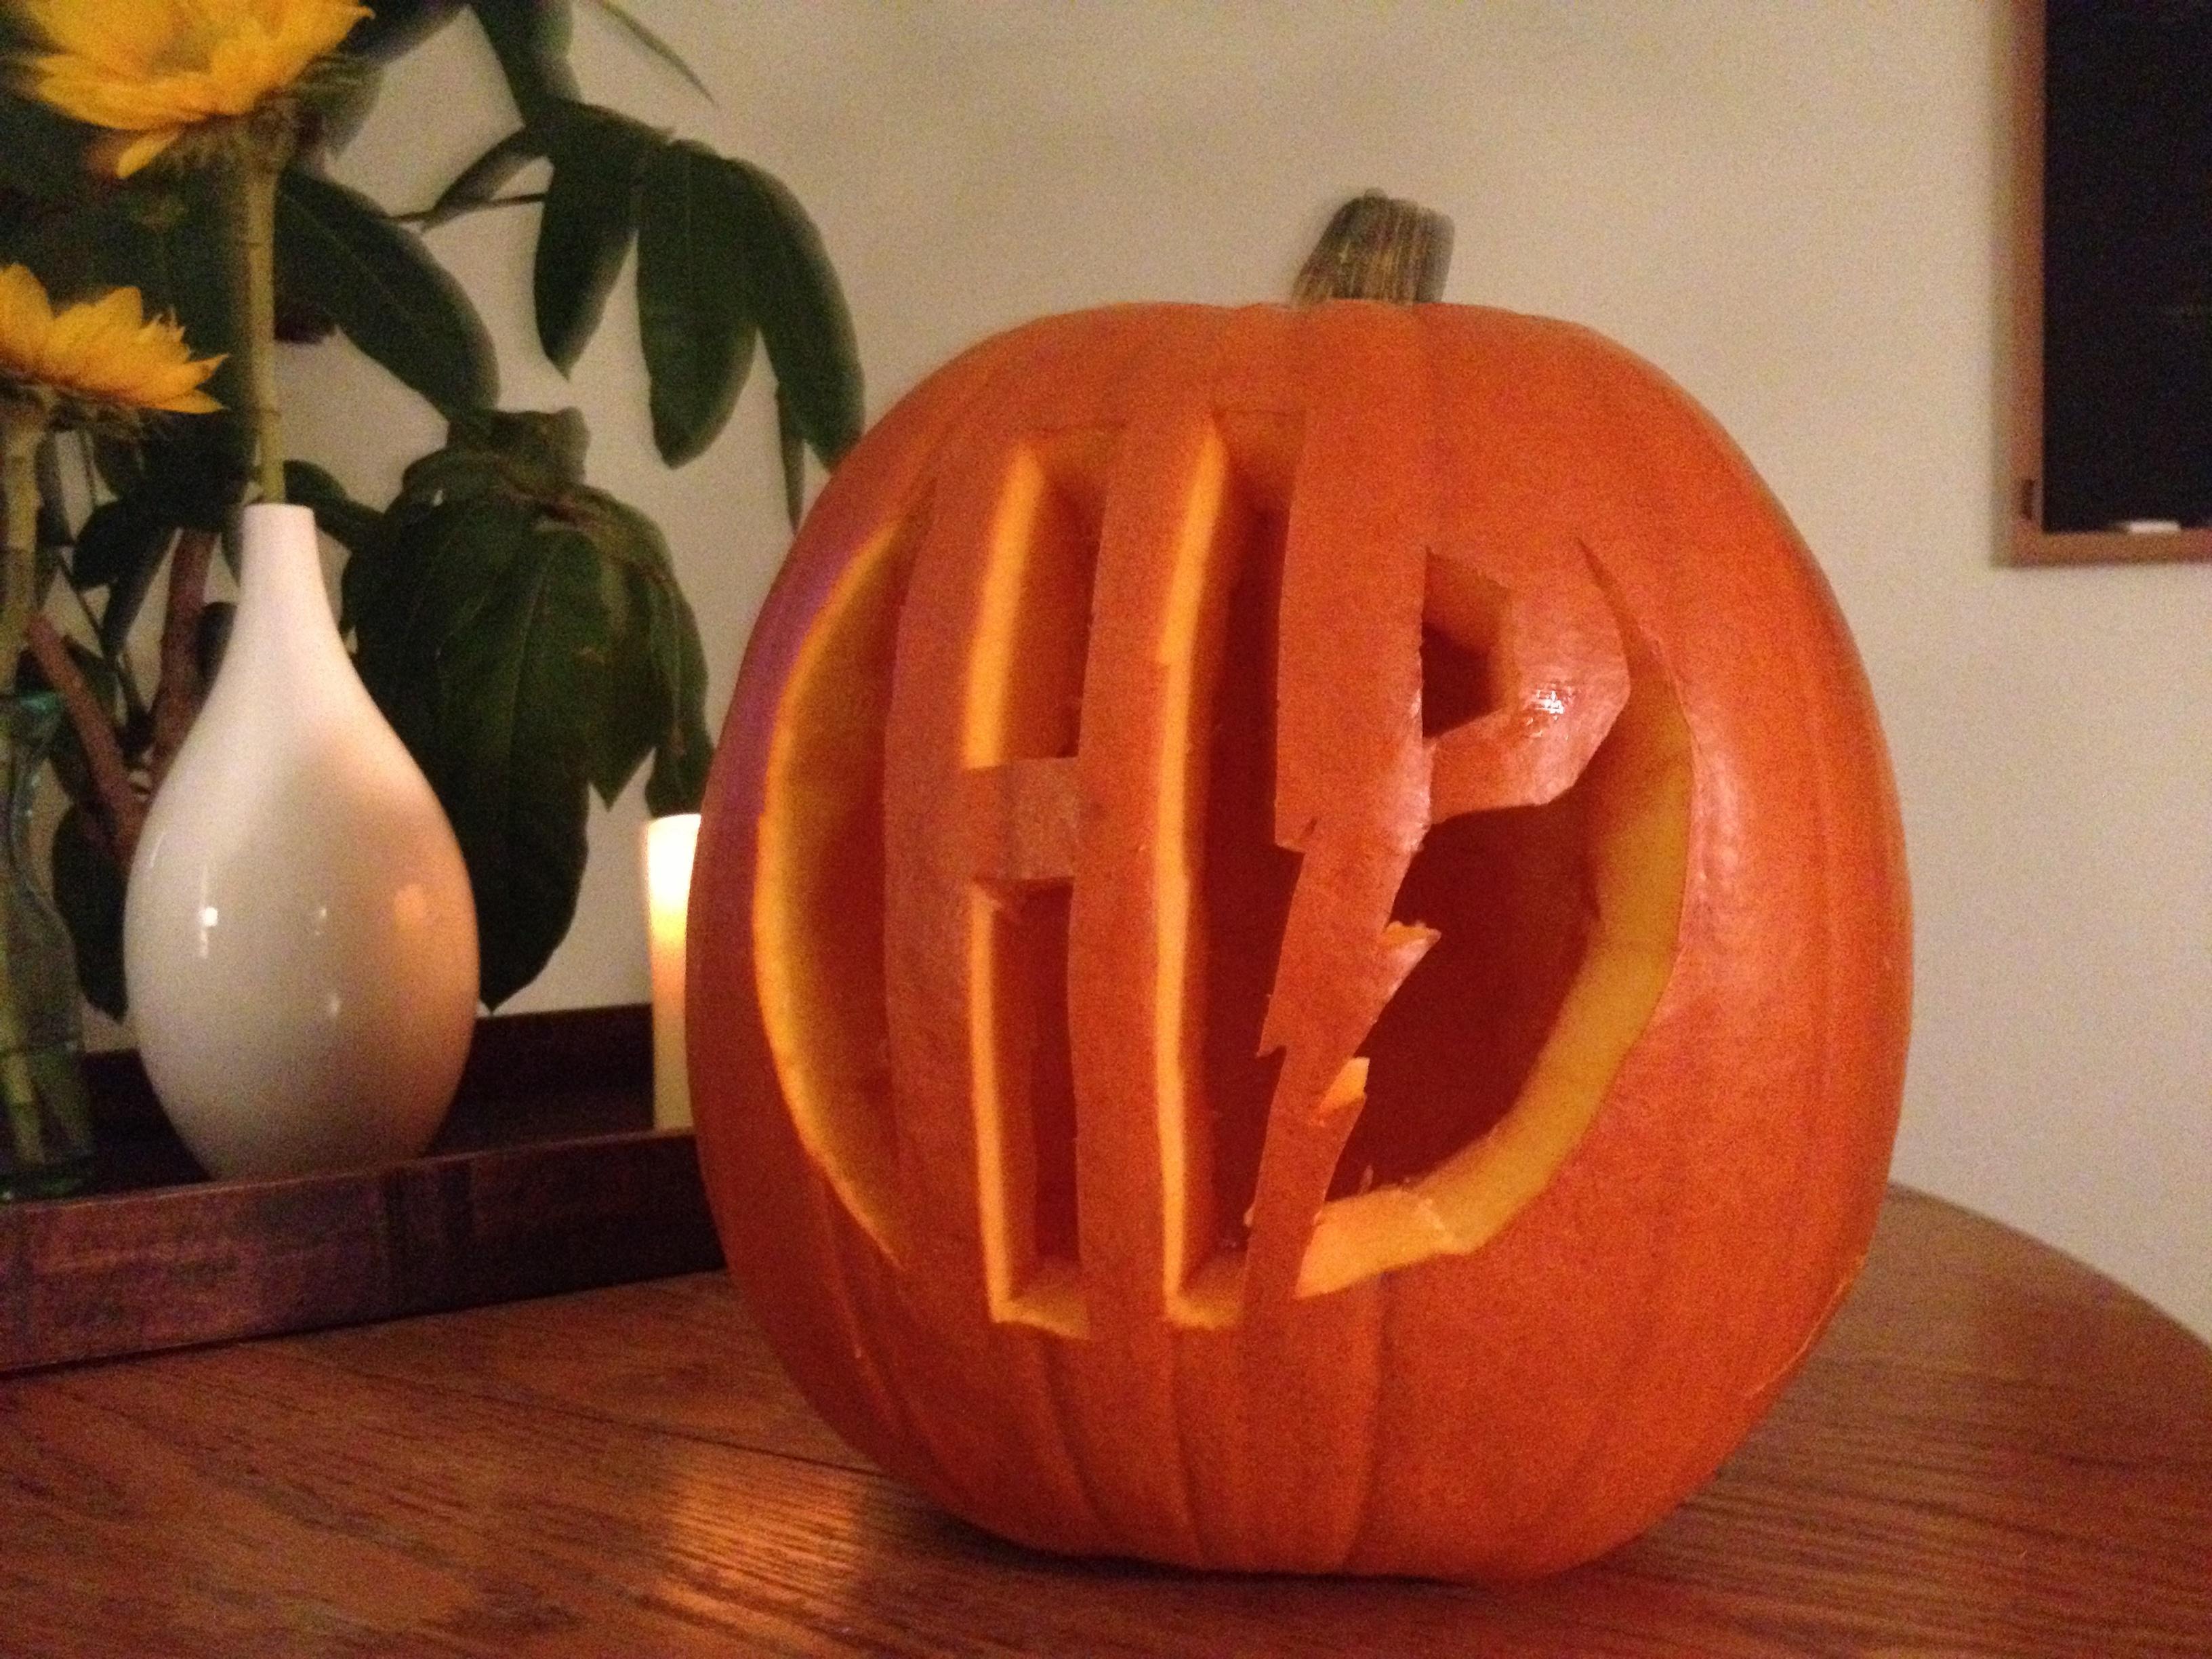 Harry Potter Pumpkin Carving Stencils, Patterns 2018 | Pumpkin - Free Printable Harry Potter Pumpkin Carving Patterns